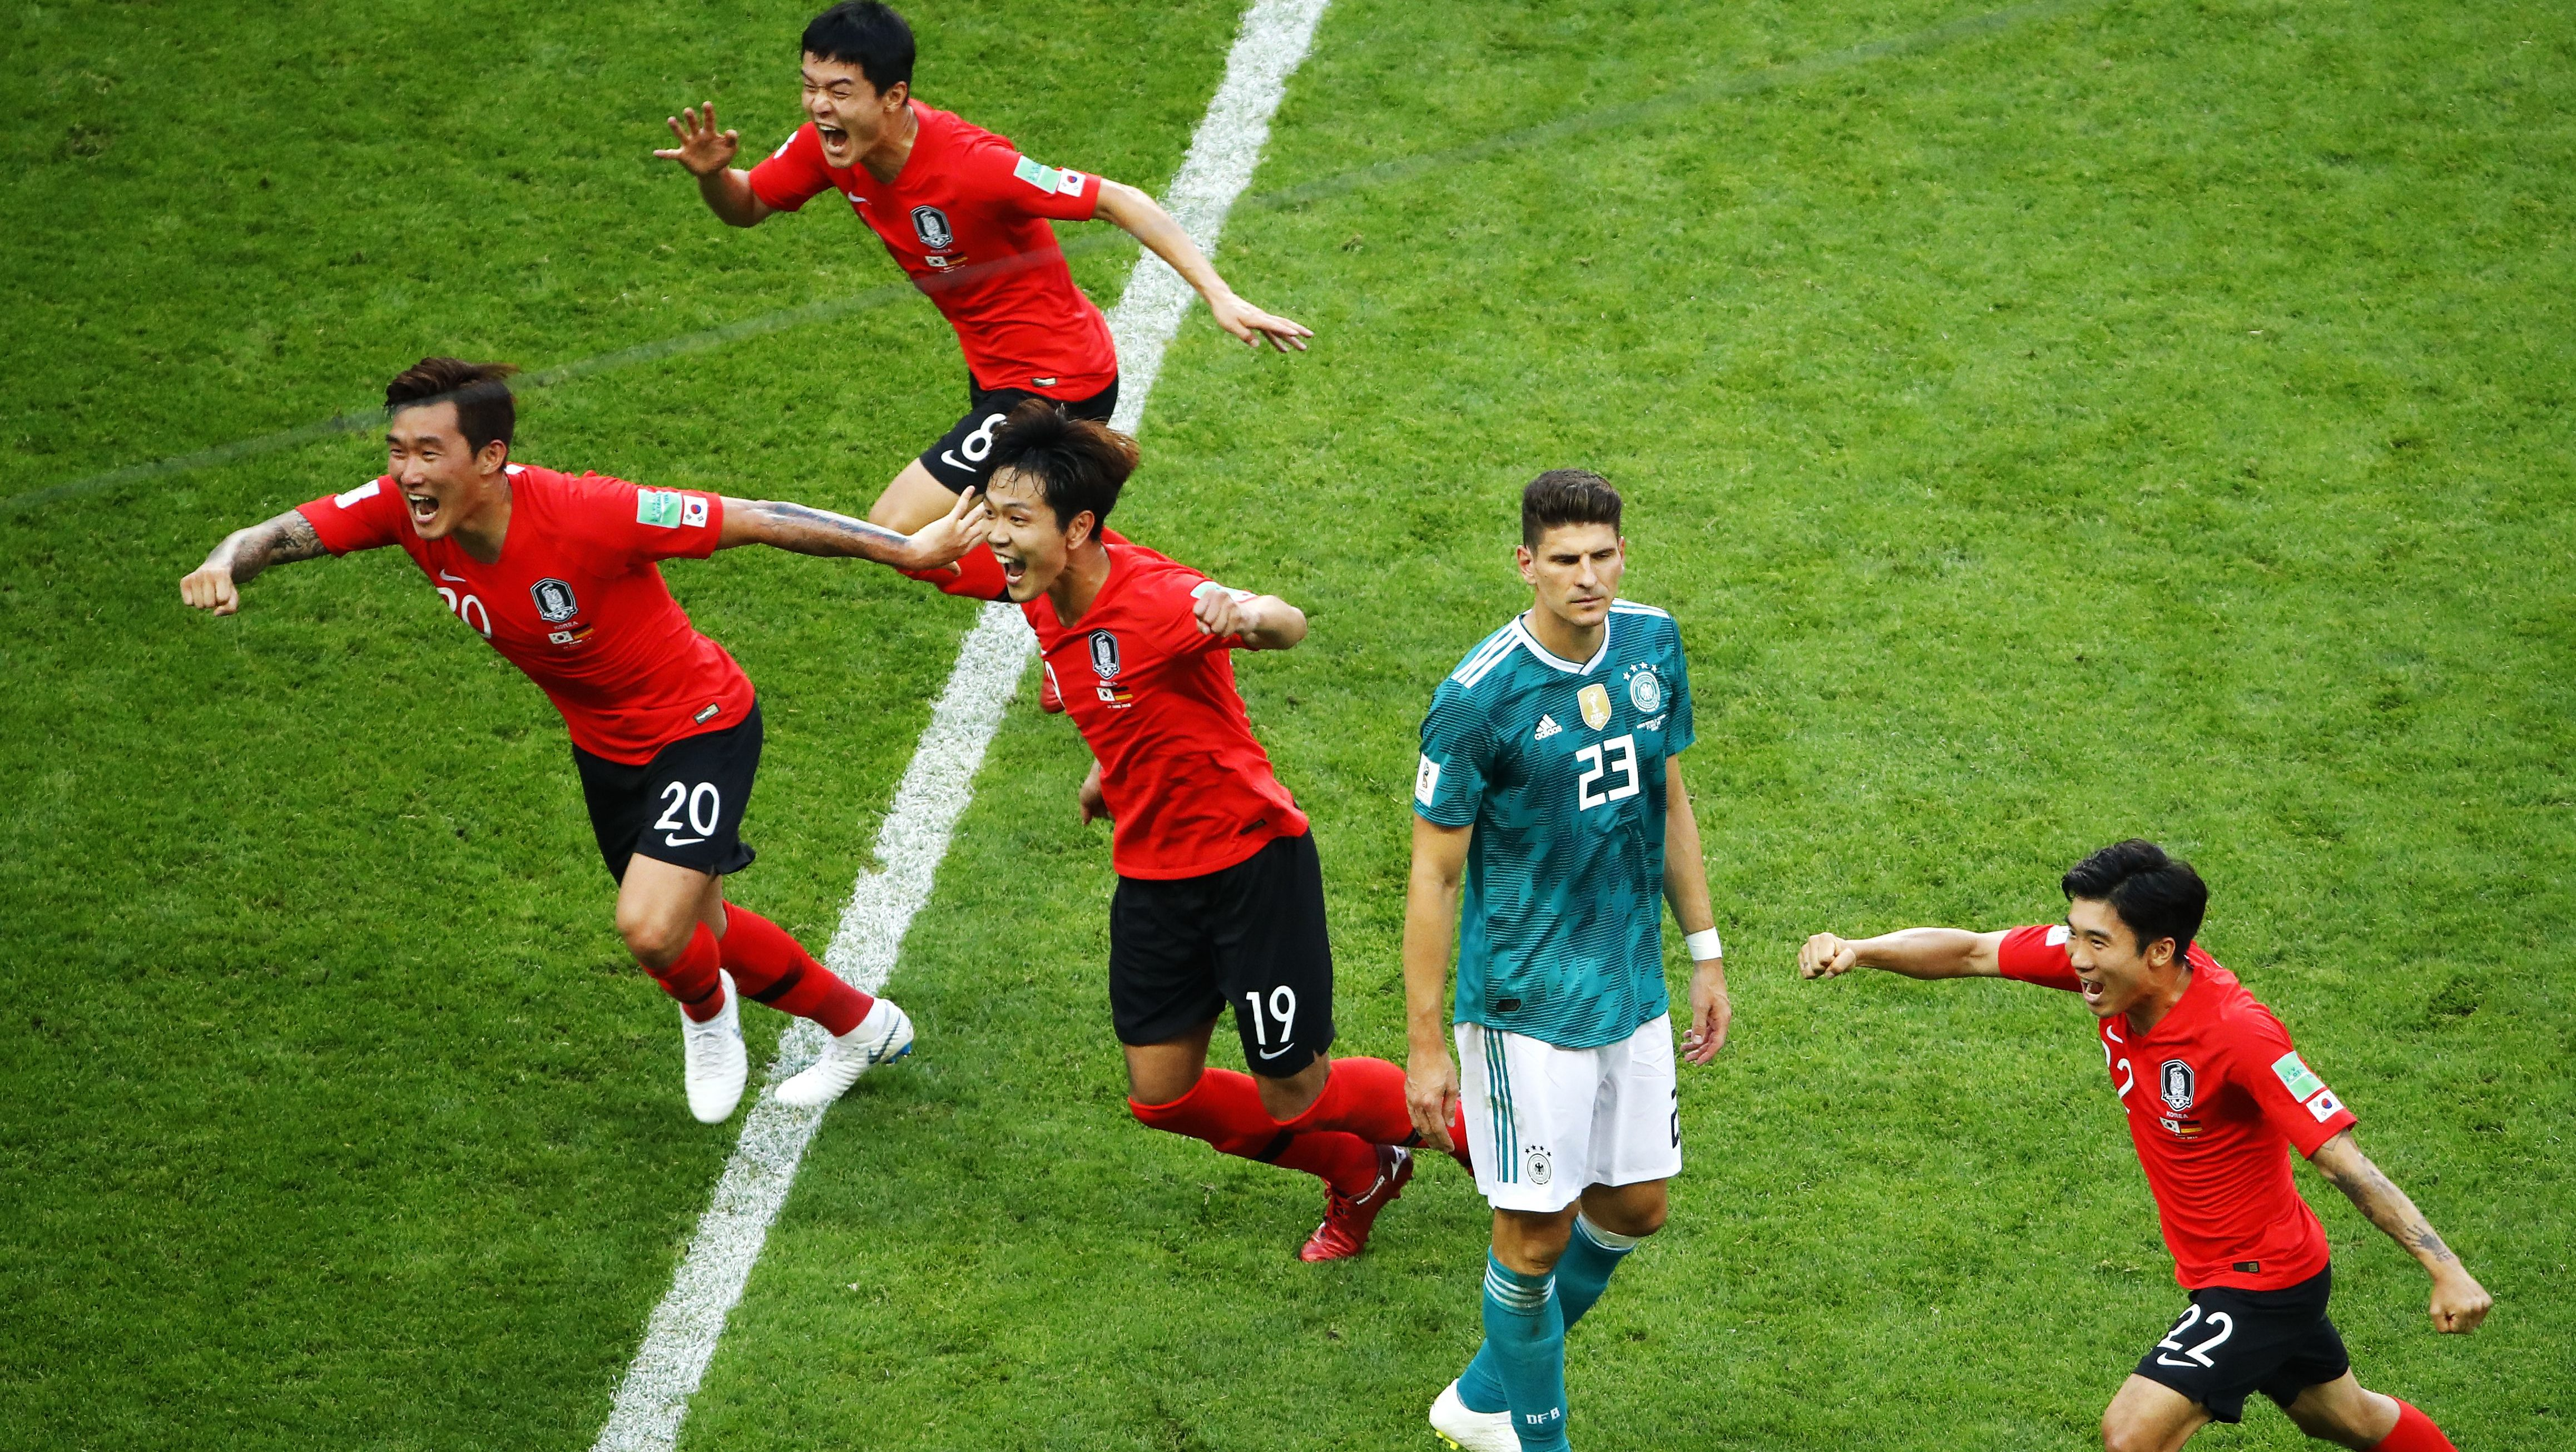 Group F South Korea vs Germany, Kazan, Russian Federation – 27 Jun 2018